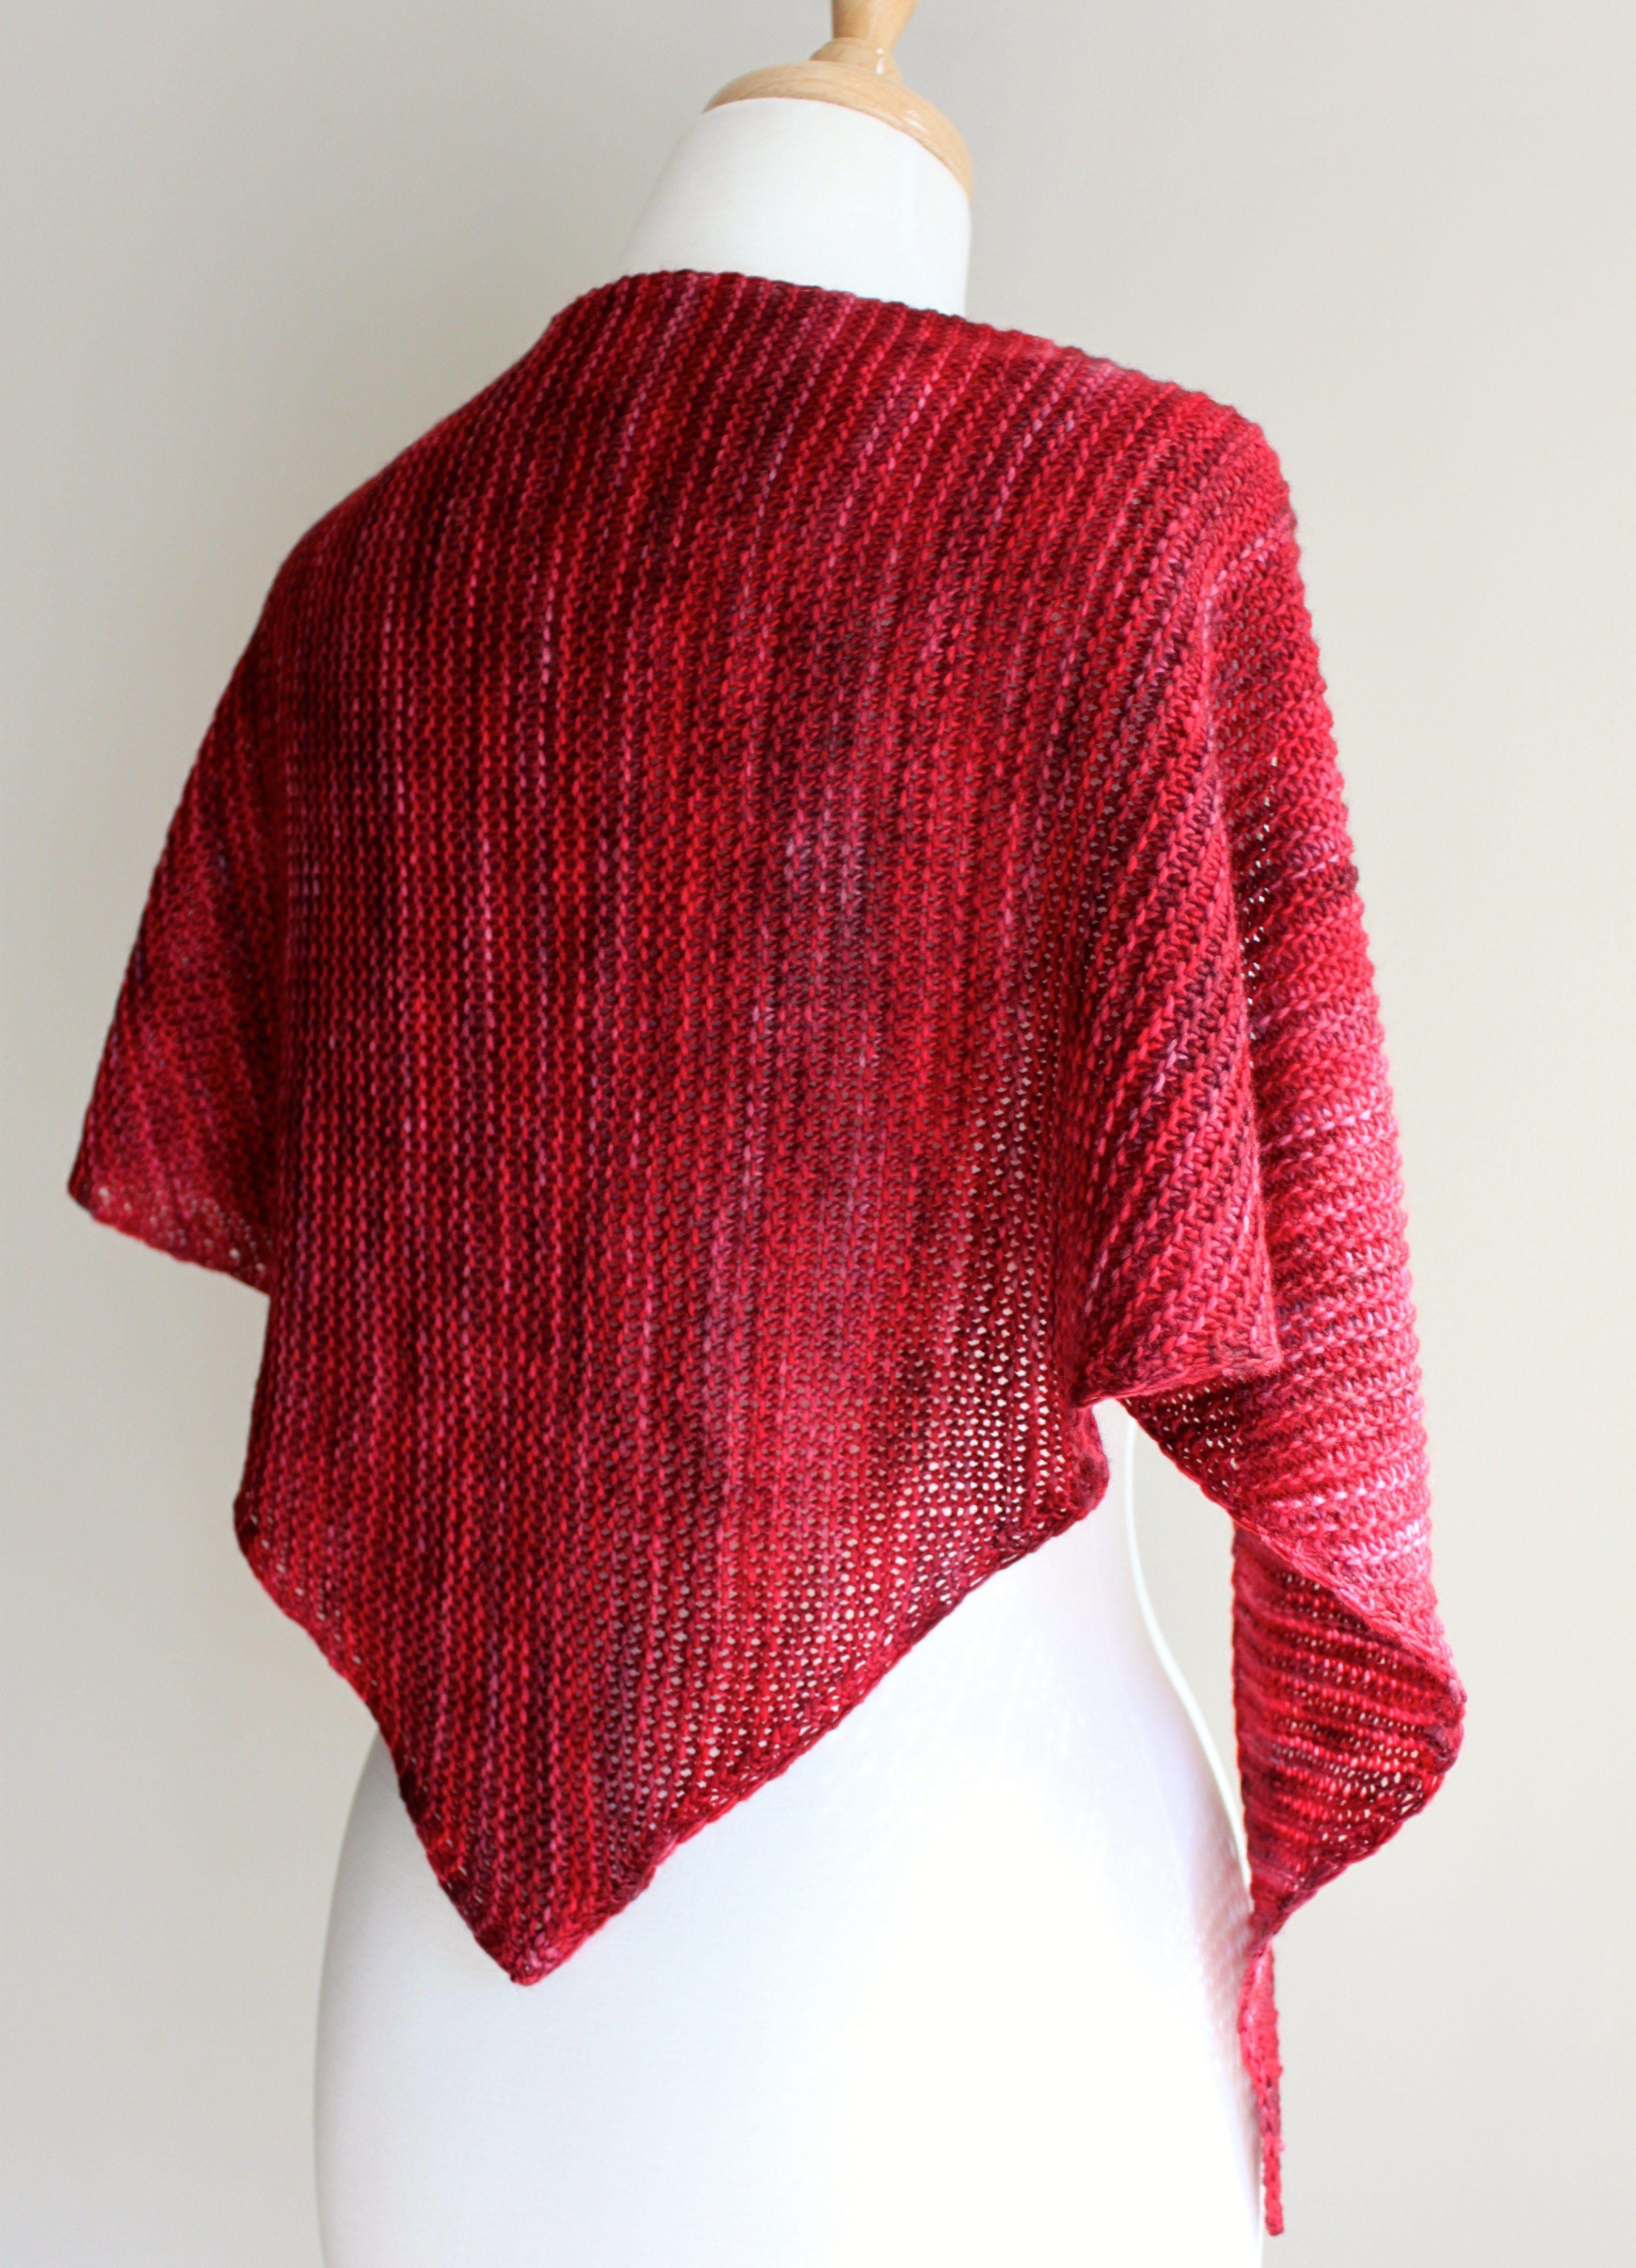 Free Knitting Patterns: Truly Triangular Scarf | Pinterest | Scarves ...